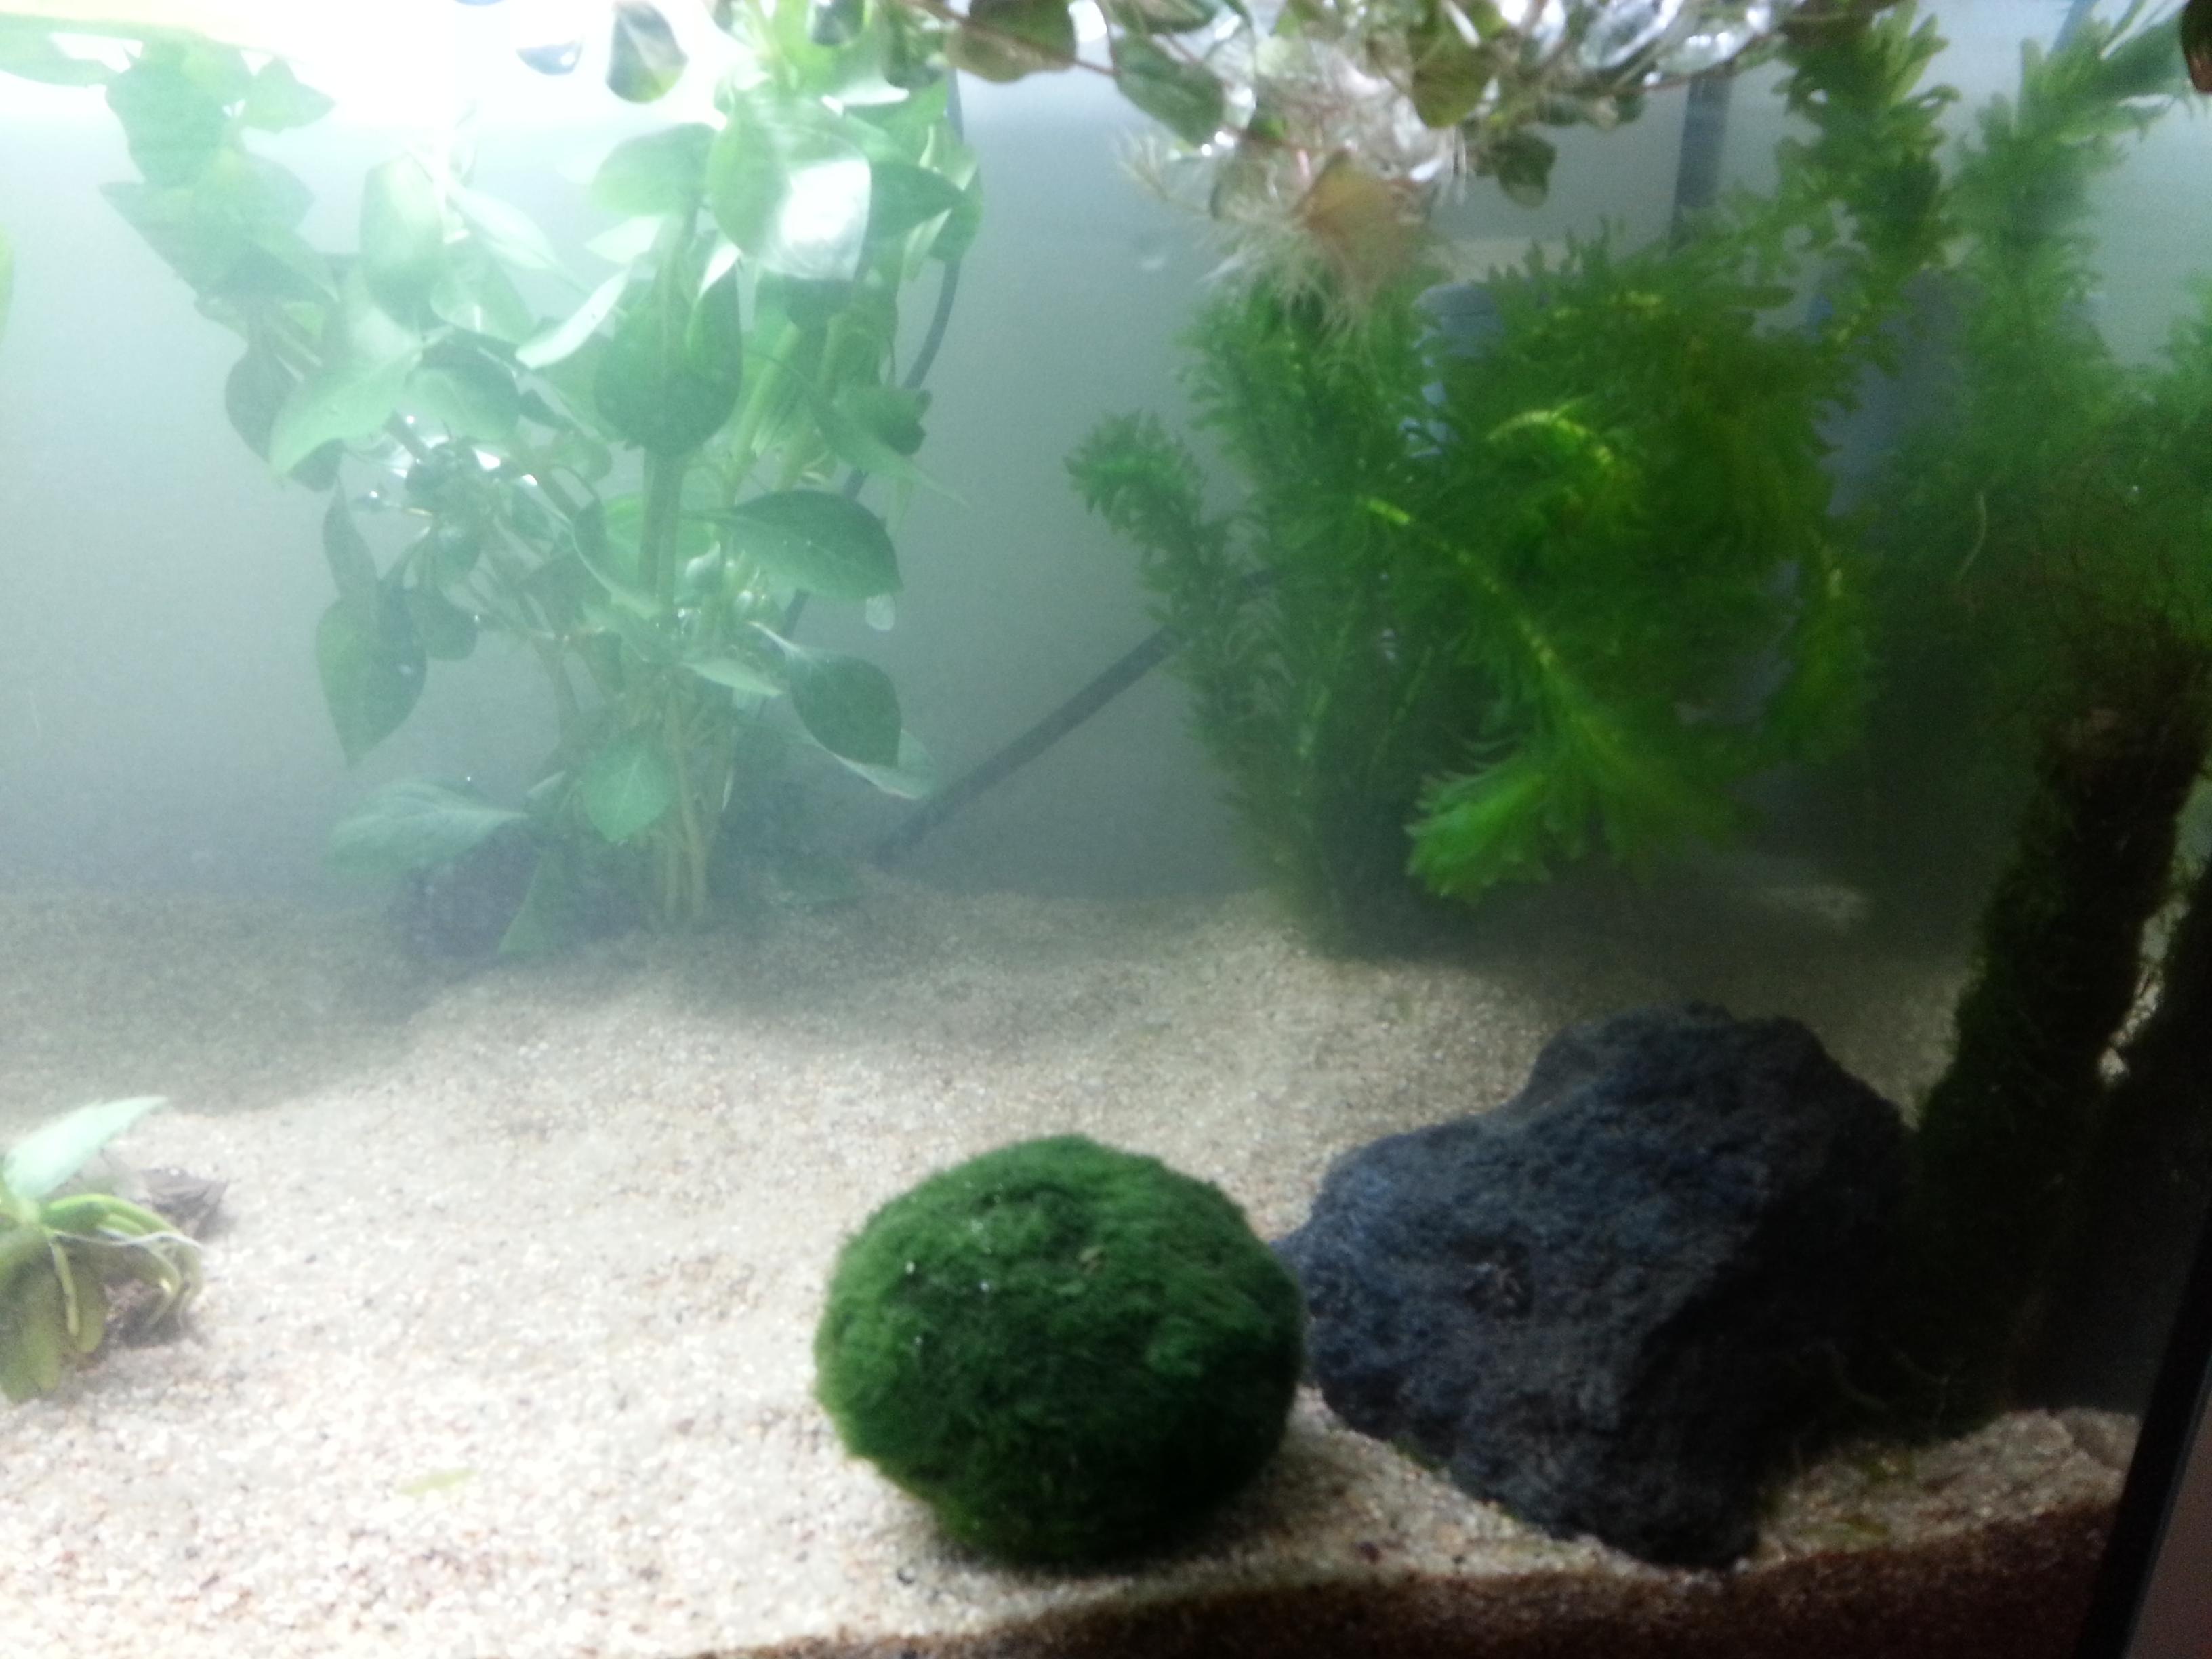 plante dans un aquarium 49183020130613003128